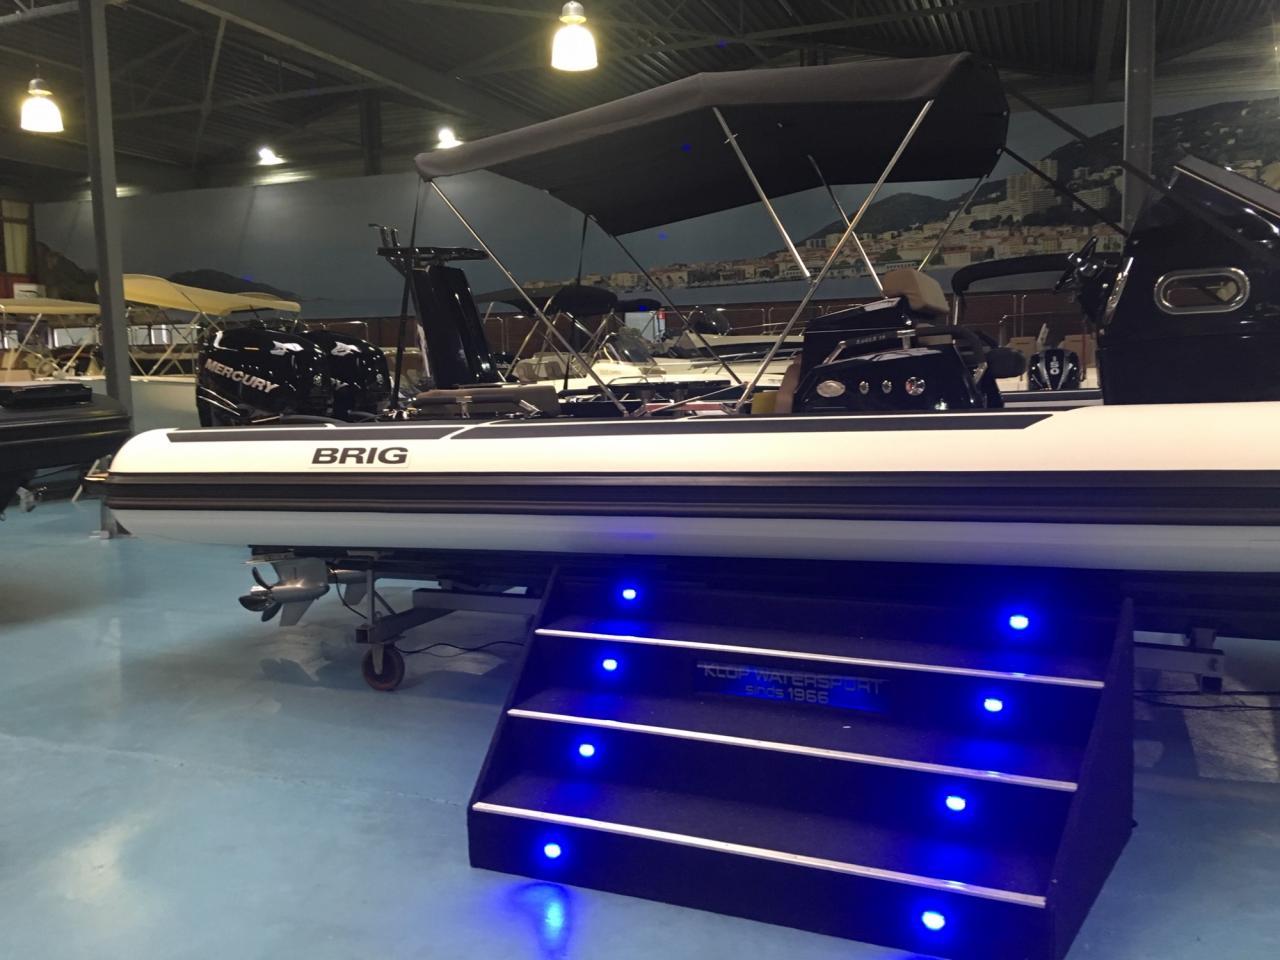 Brig Eagle 10 rib met 2x Mercury Verado 350 pk! 5